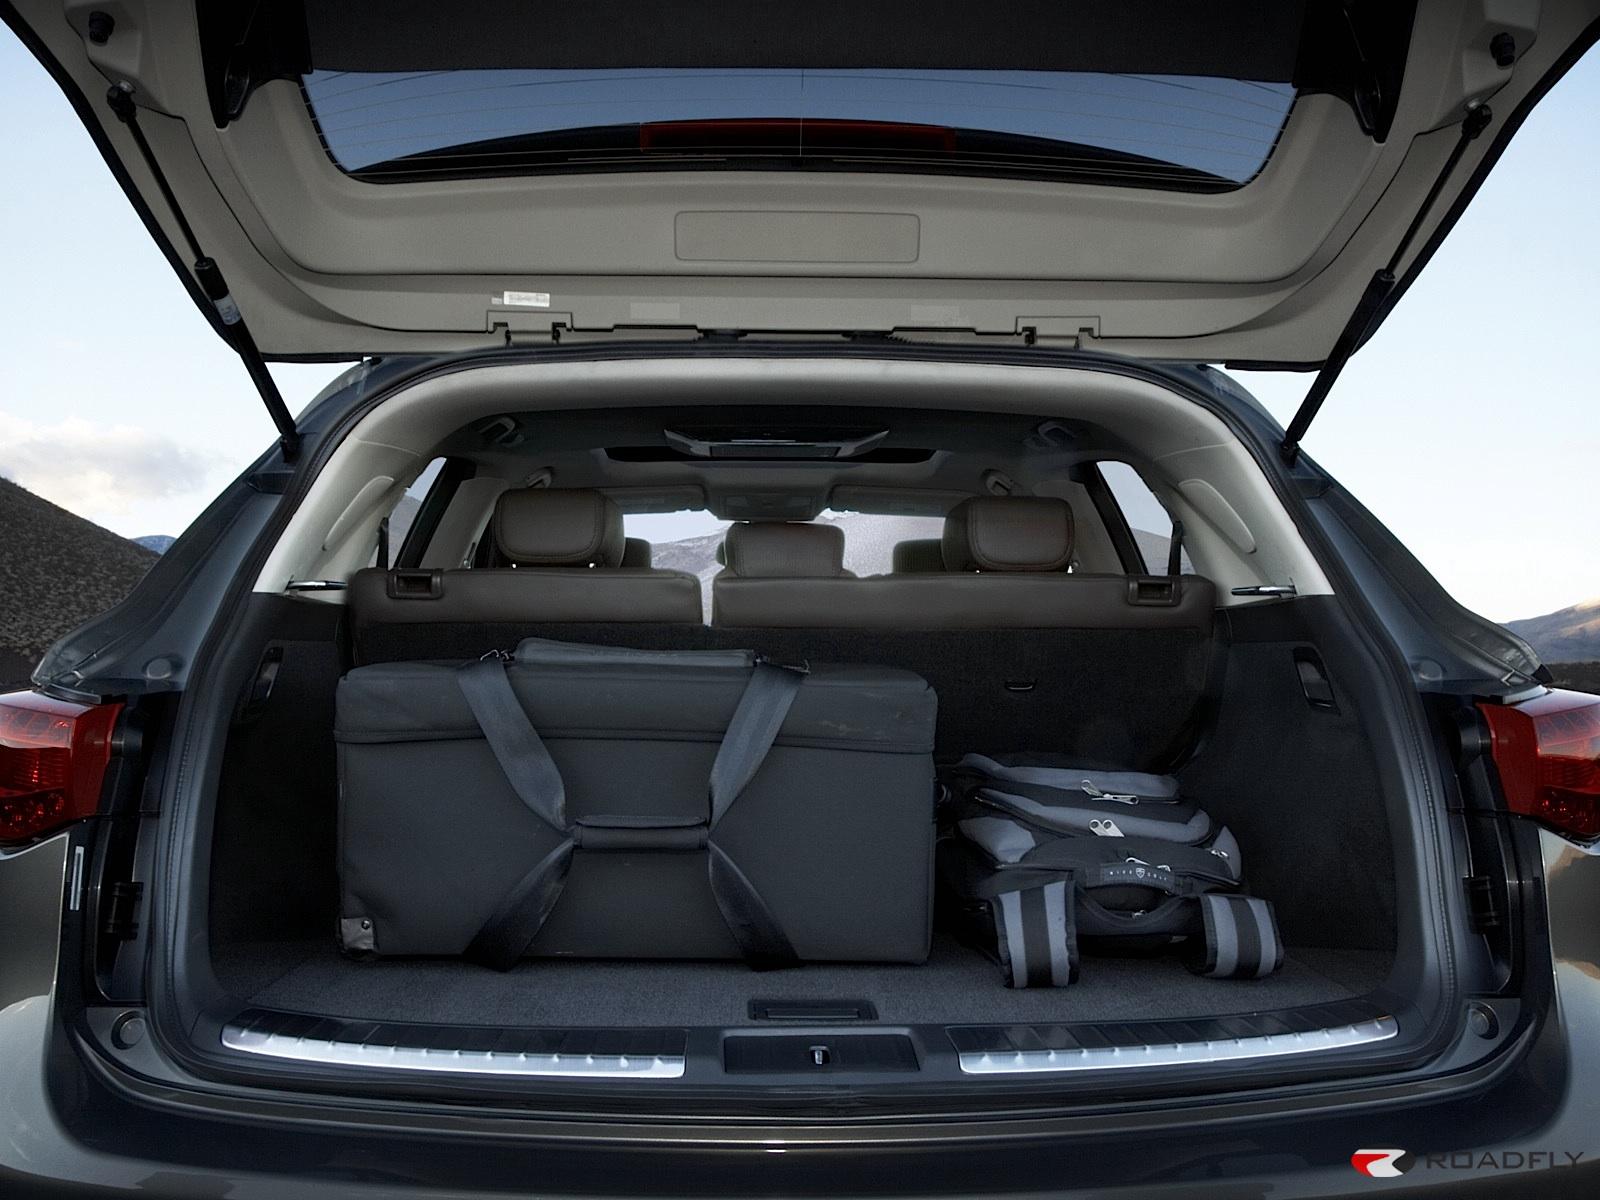 Infiniti fx 35 interior worldcar infiniti fx 35 interior vanachro Image collections